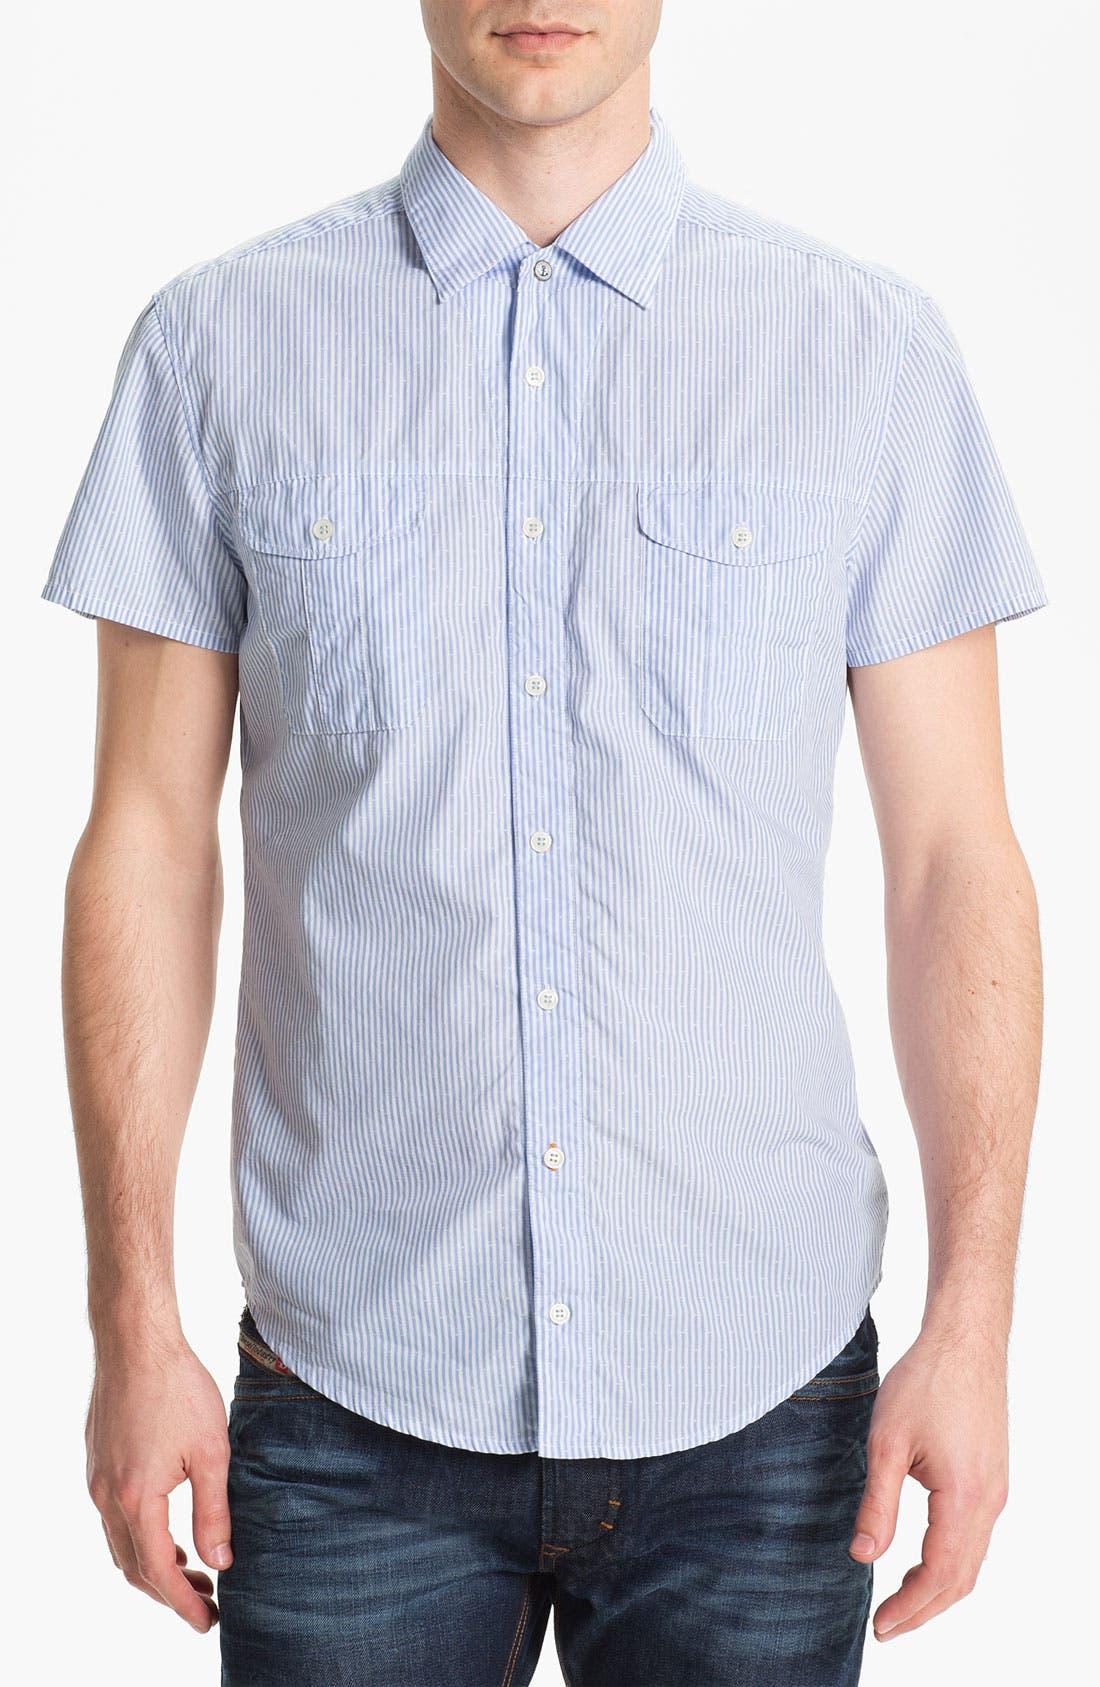 Alternate Image 1 Selected - BOSS Orange 'Casoe' Stripe Woven Shirt